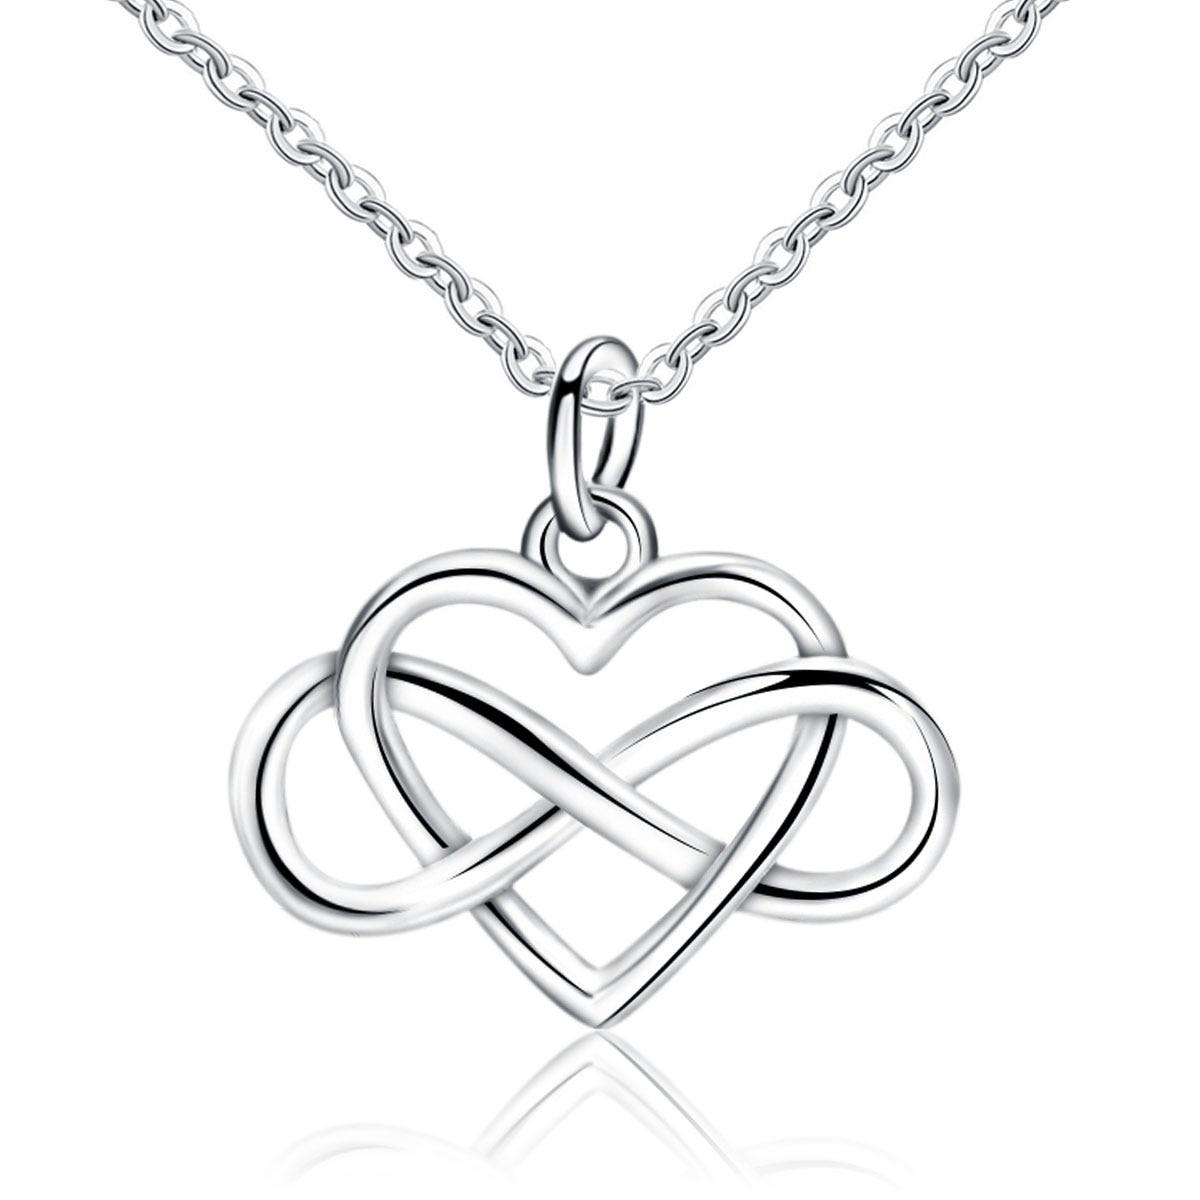 MMC Infinity Dancing Silver Pendants Necklaces